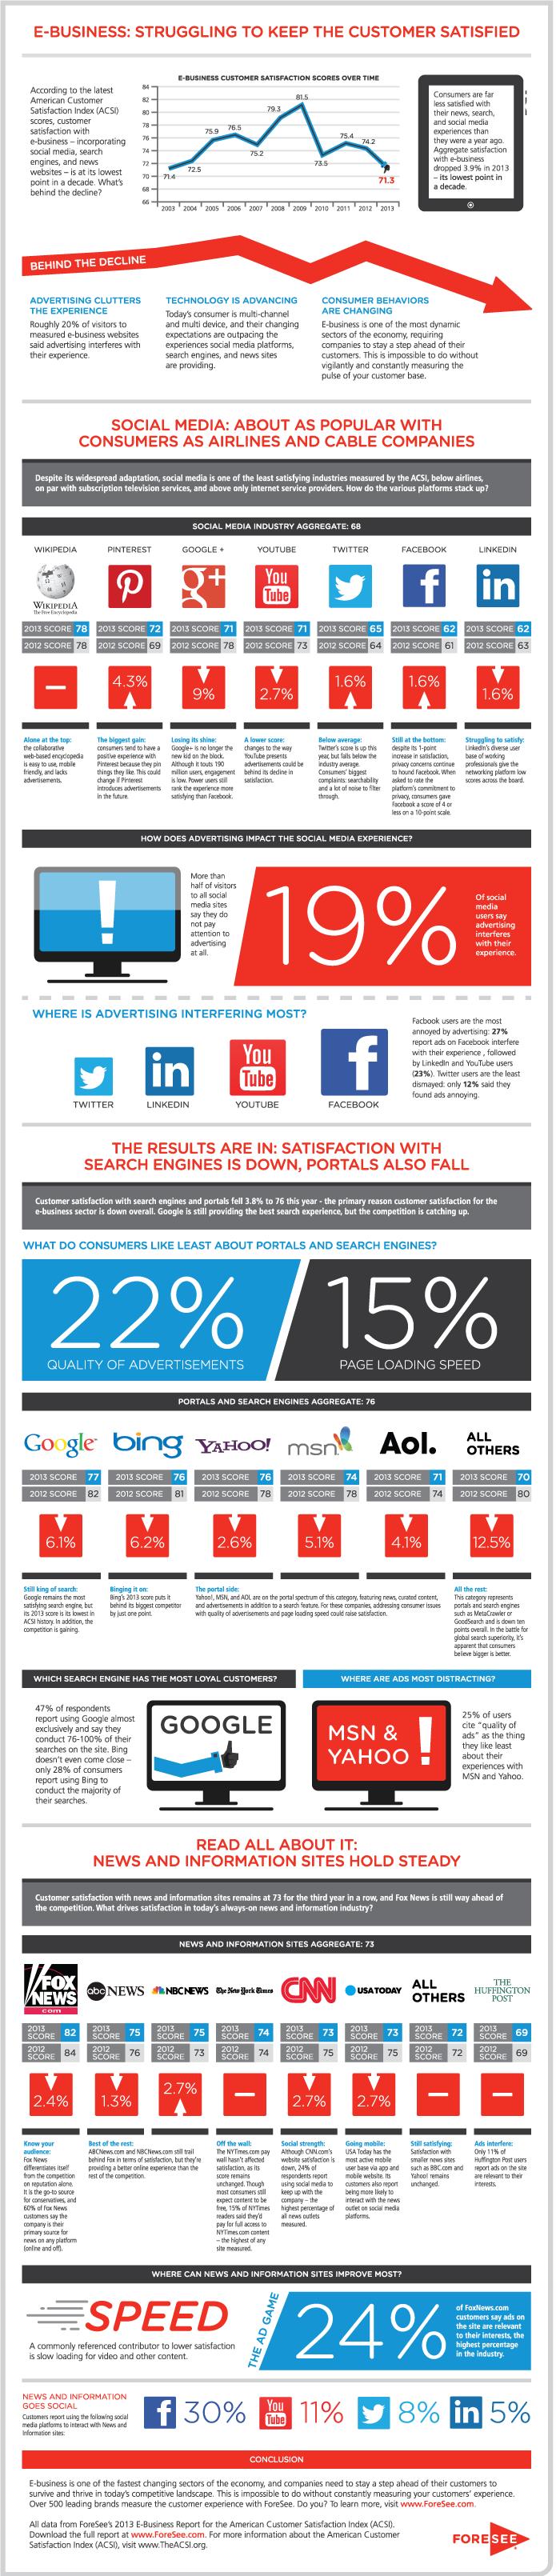 acsi-ebiz-infographic-2013-foresee